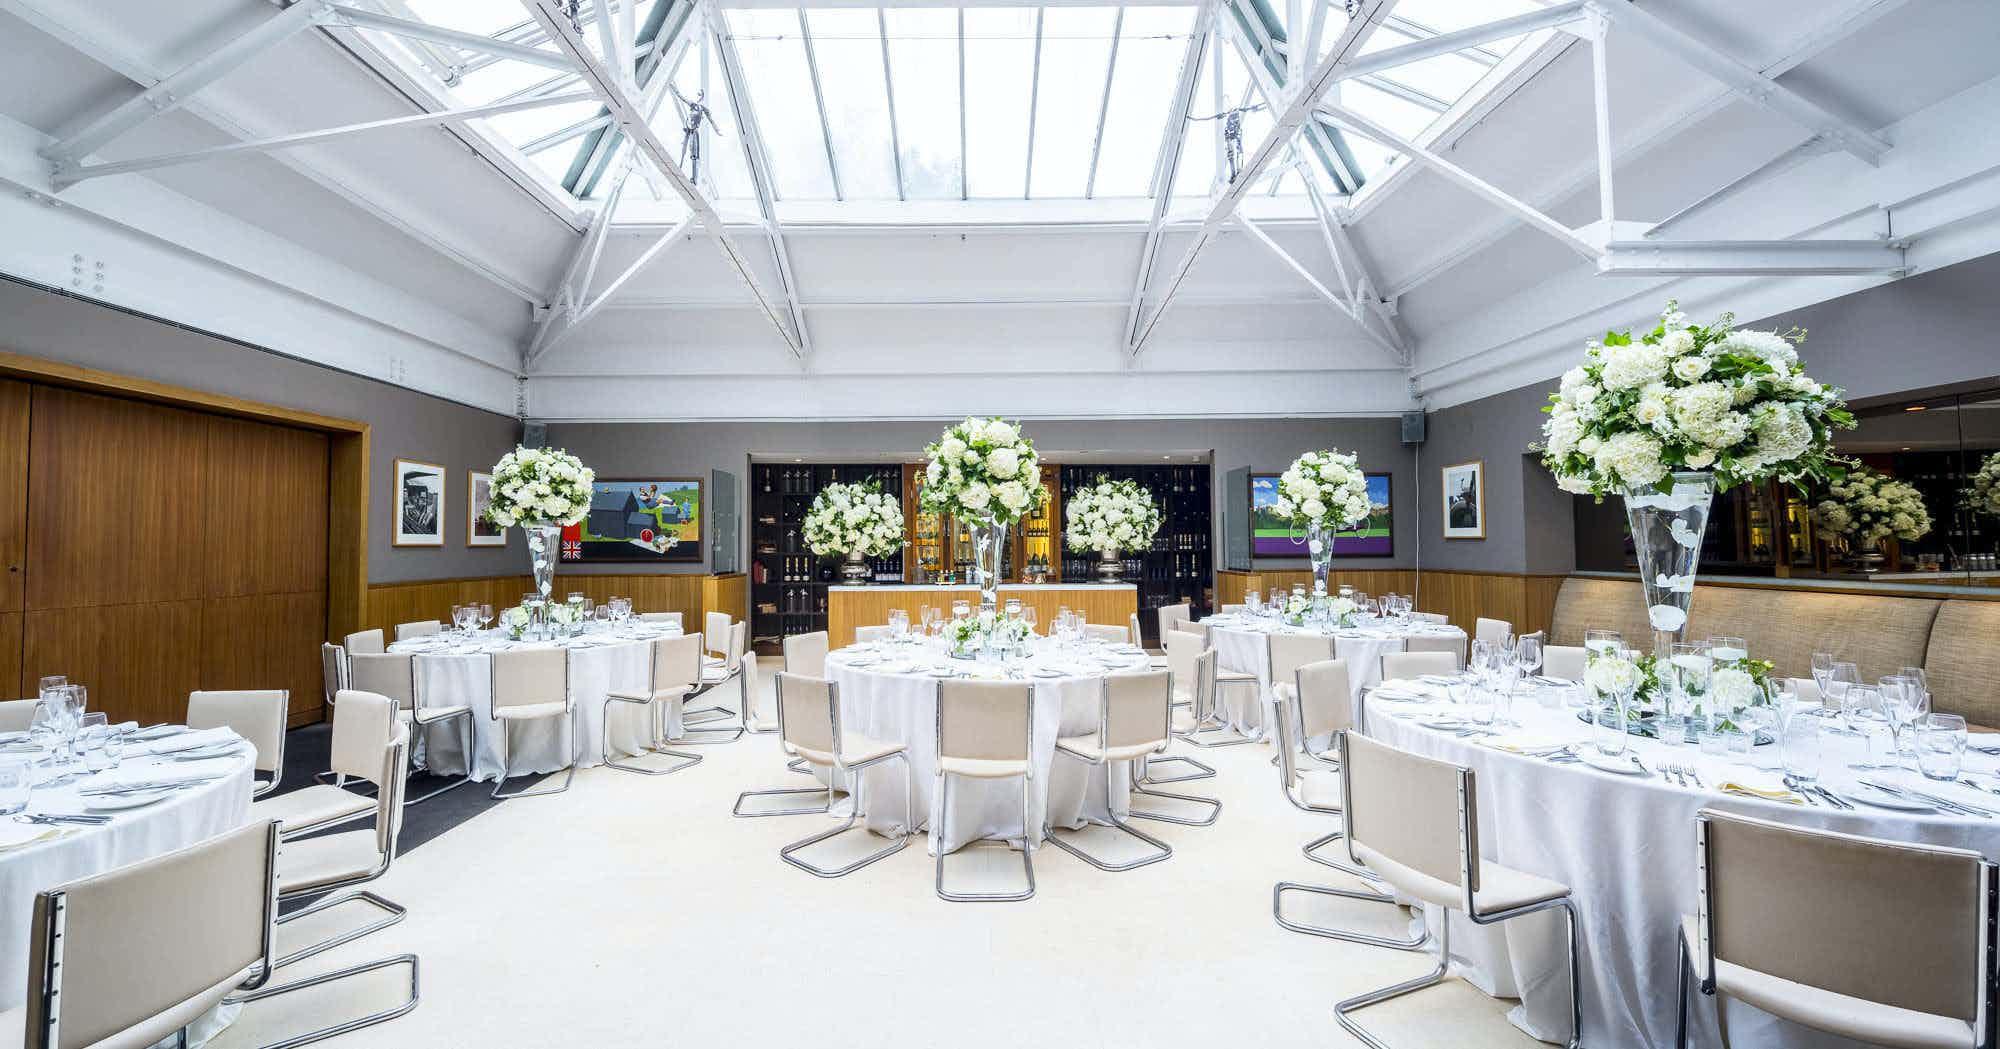 Gallery Room, Bluebird Chelsea